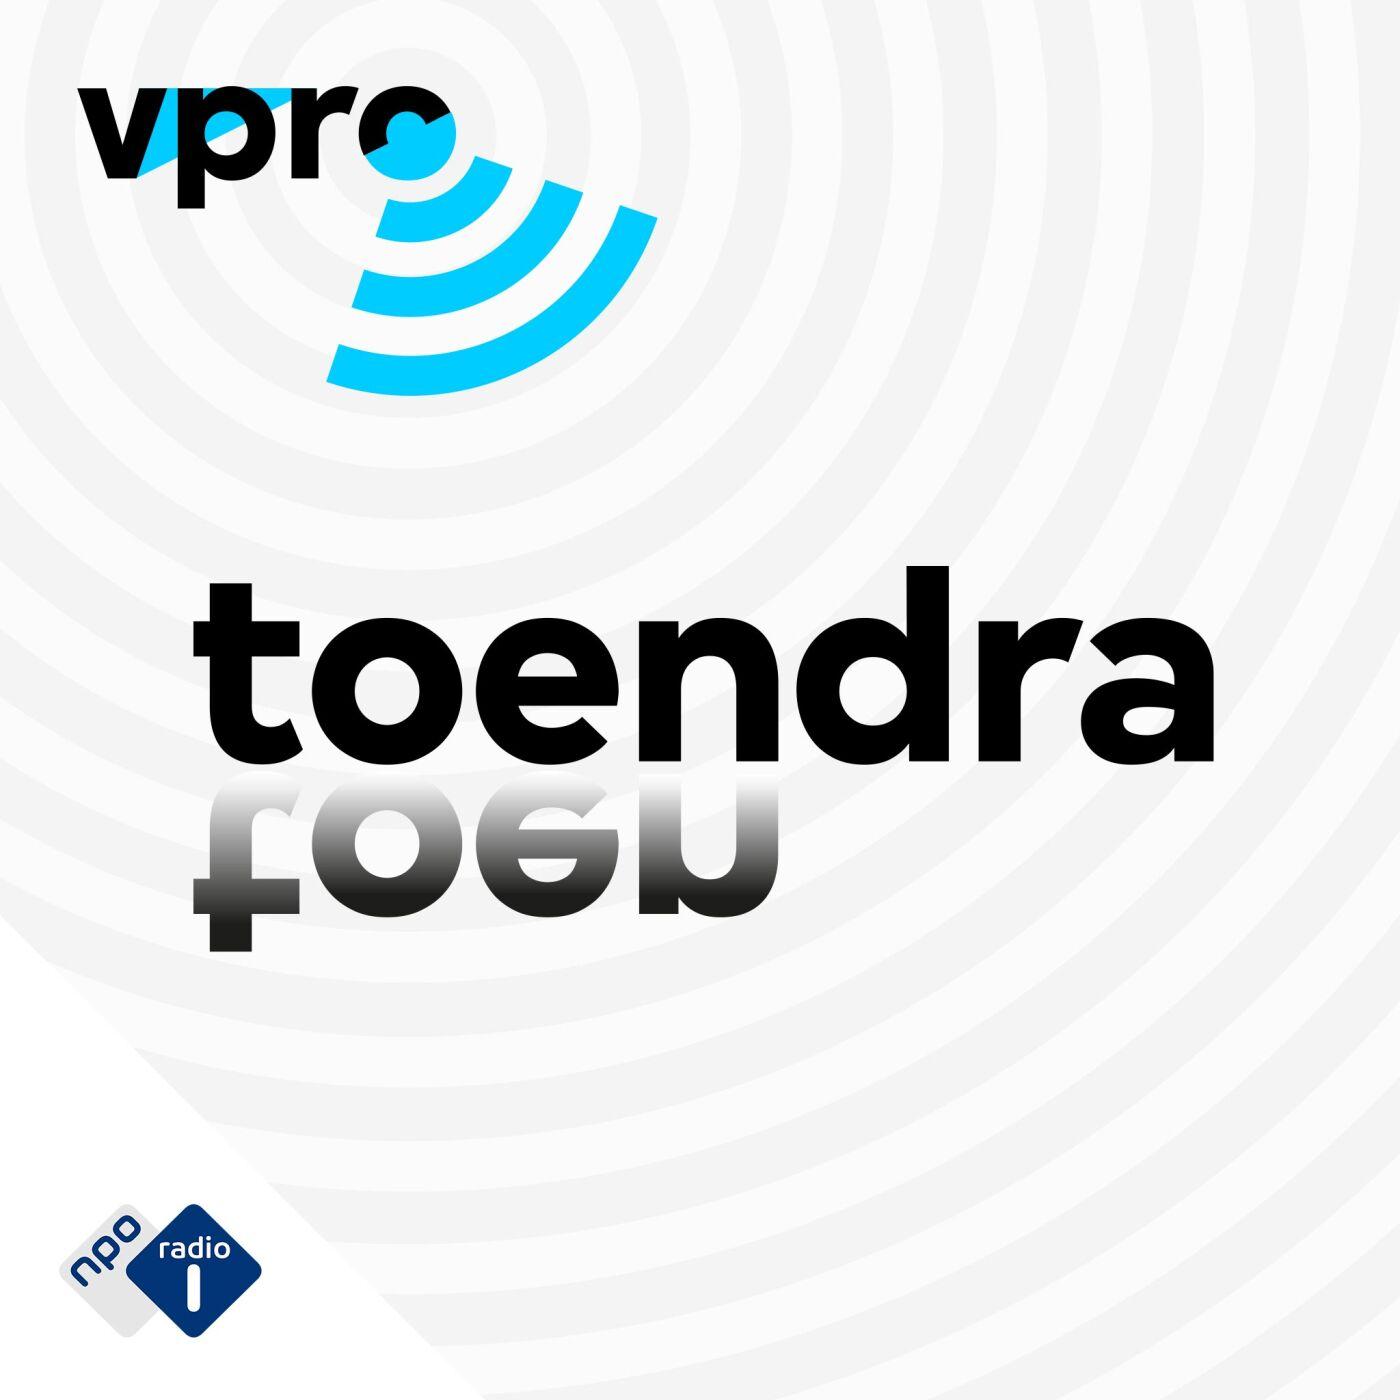 Toendra logo